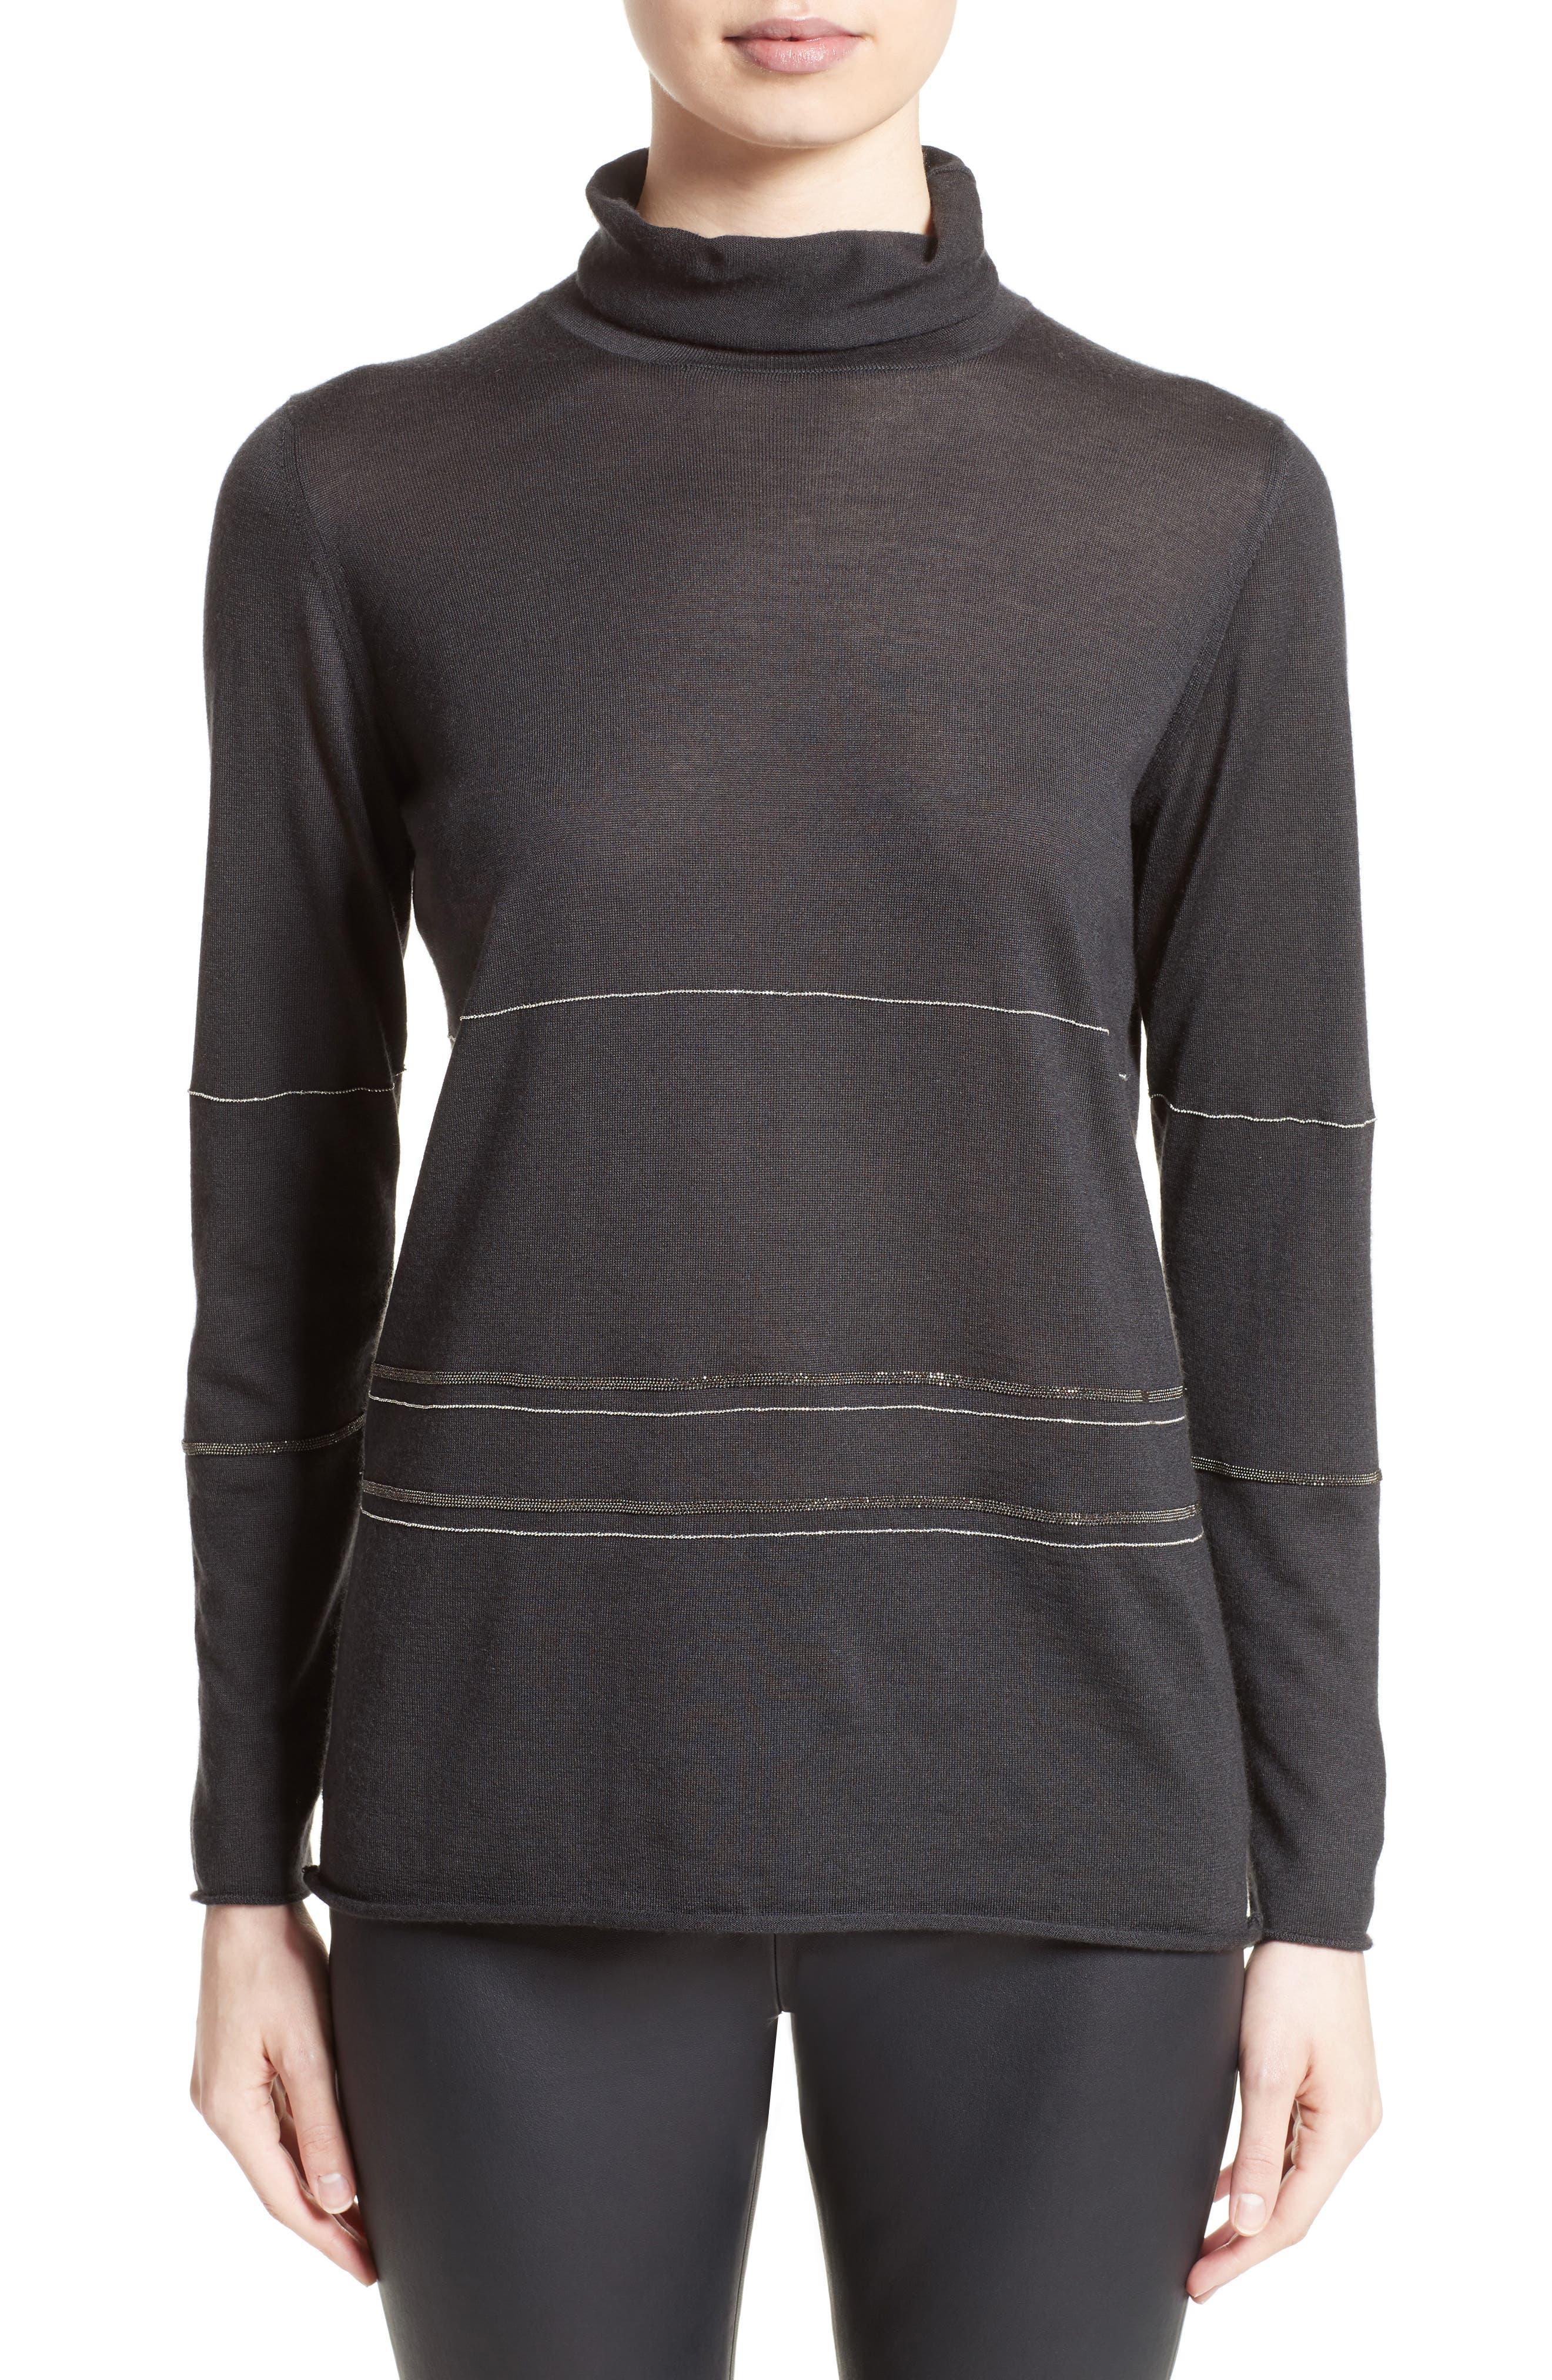 Fabiana Filippi Cashmere & Silk Turtleneck Sweater